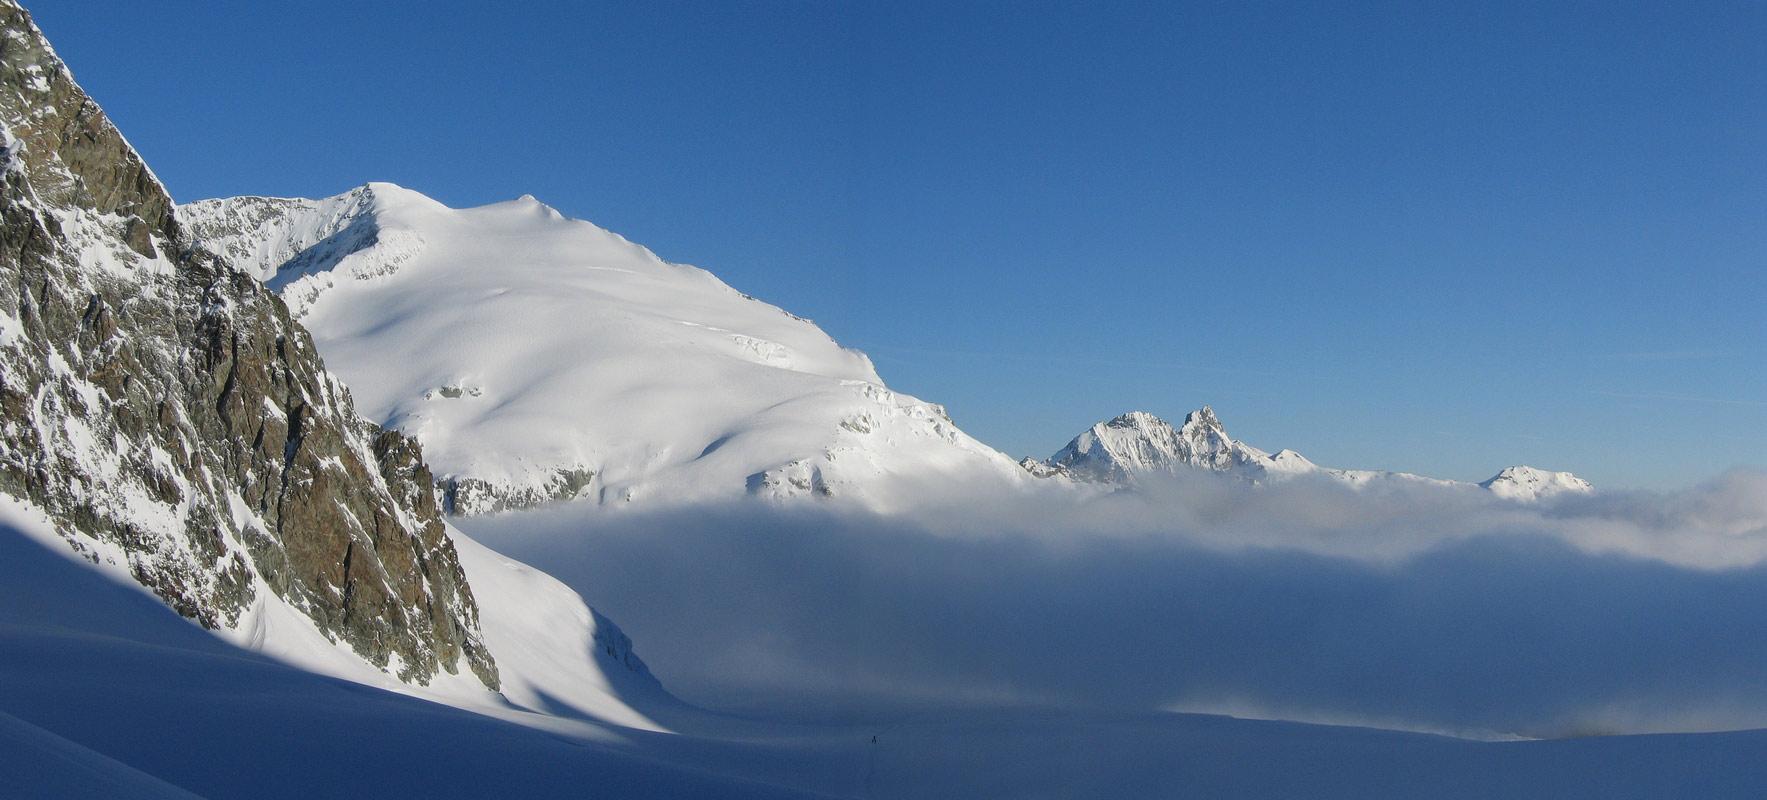 Col Valpelline, Day 6 H.R. Chamonix-Zermatt Walliser Alpen / Alpes valaisannes Švýcarsko panorama 29